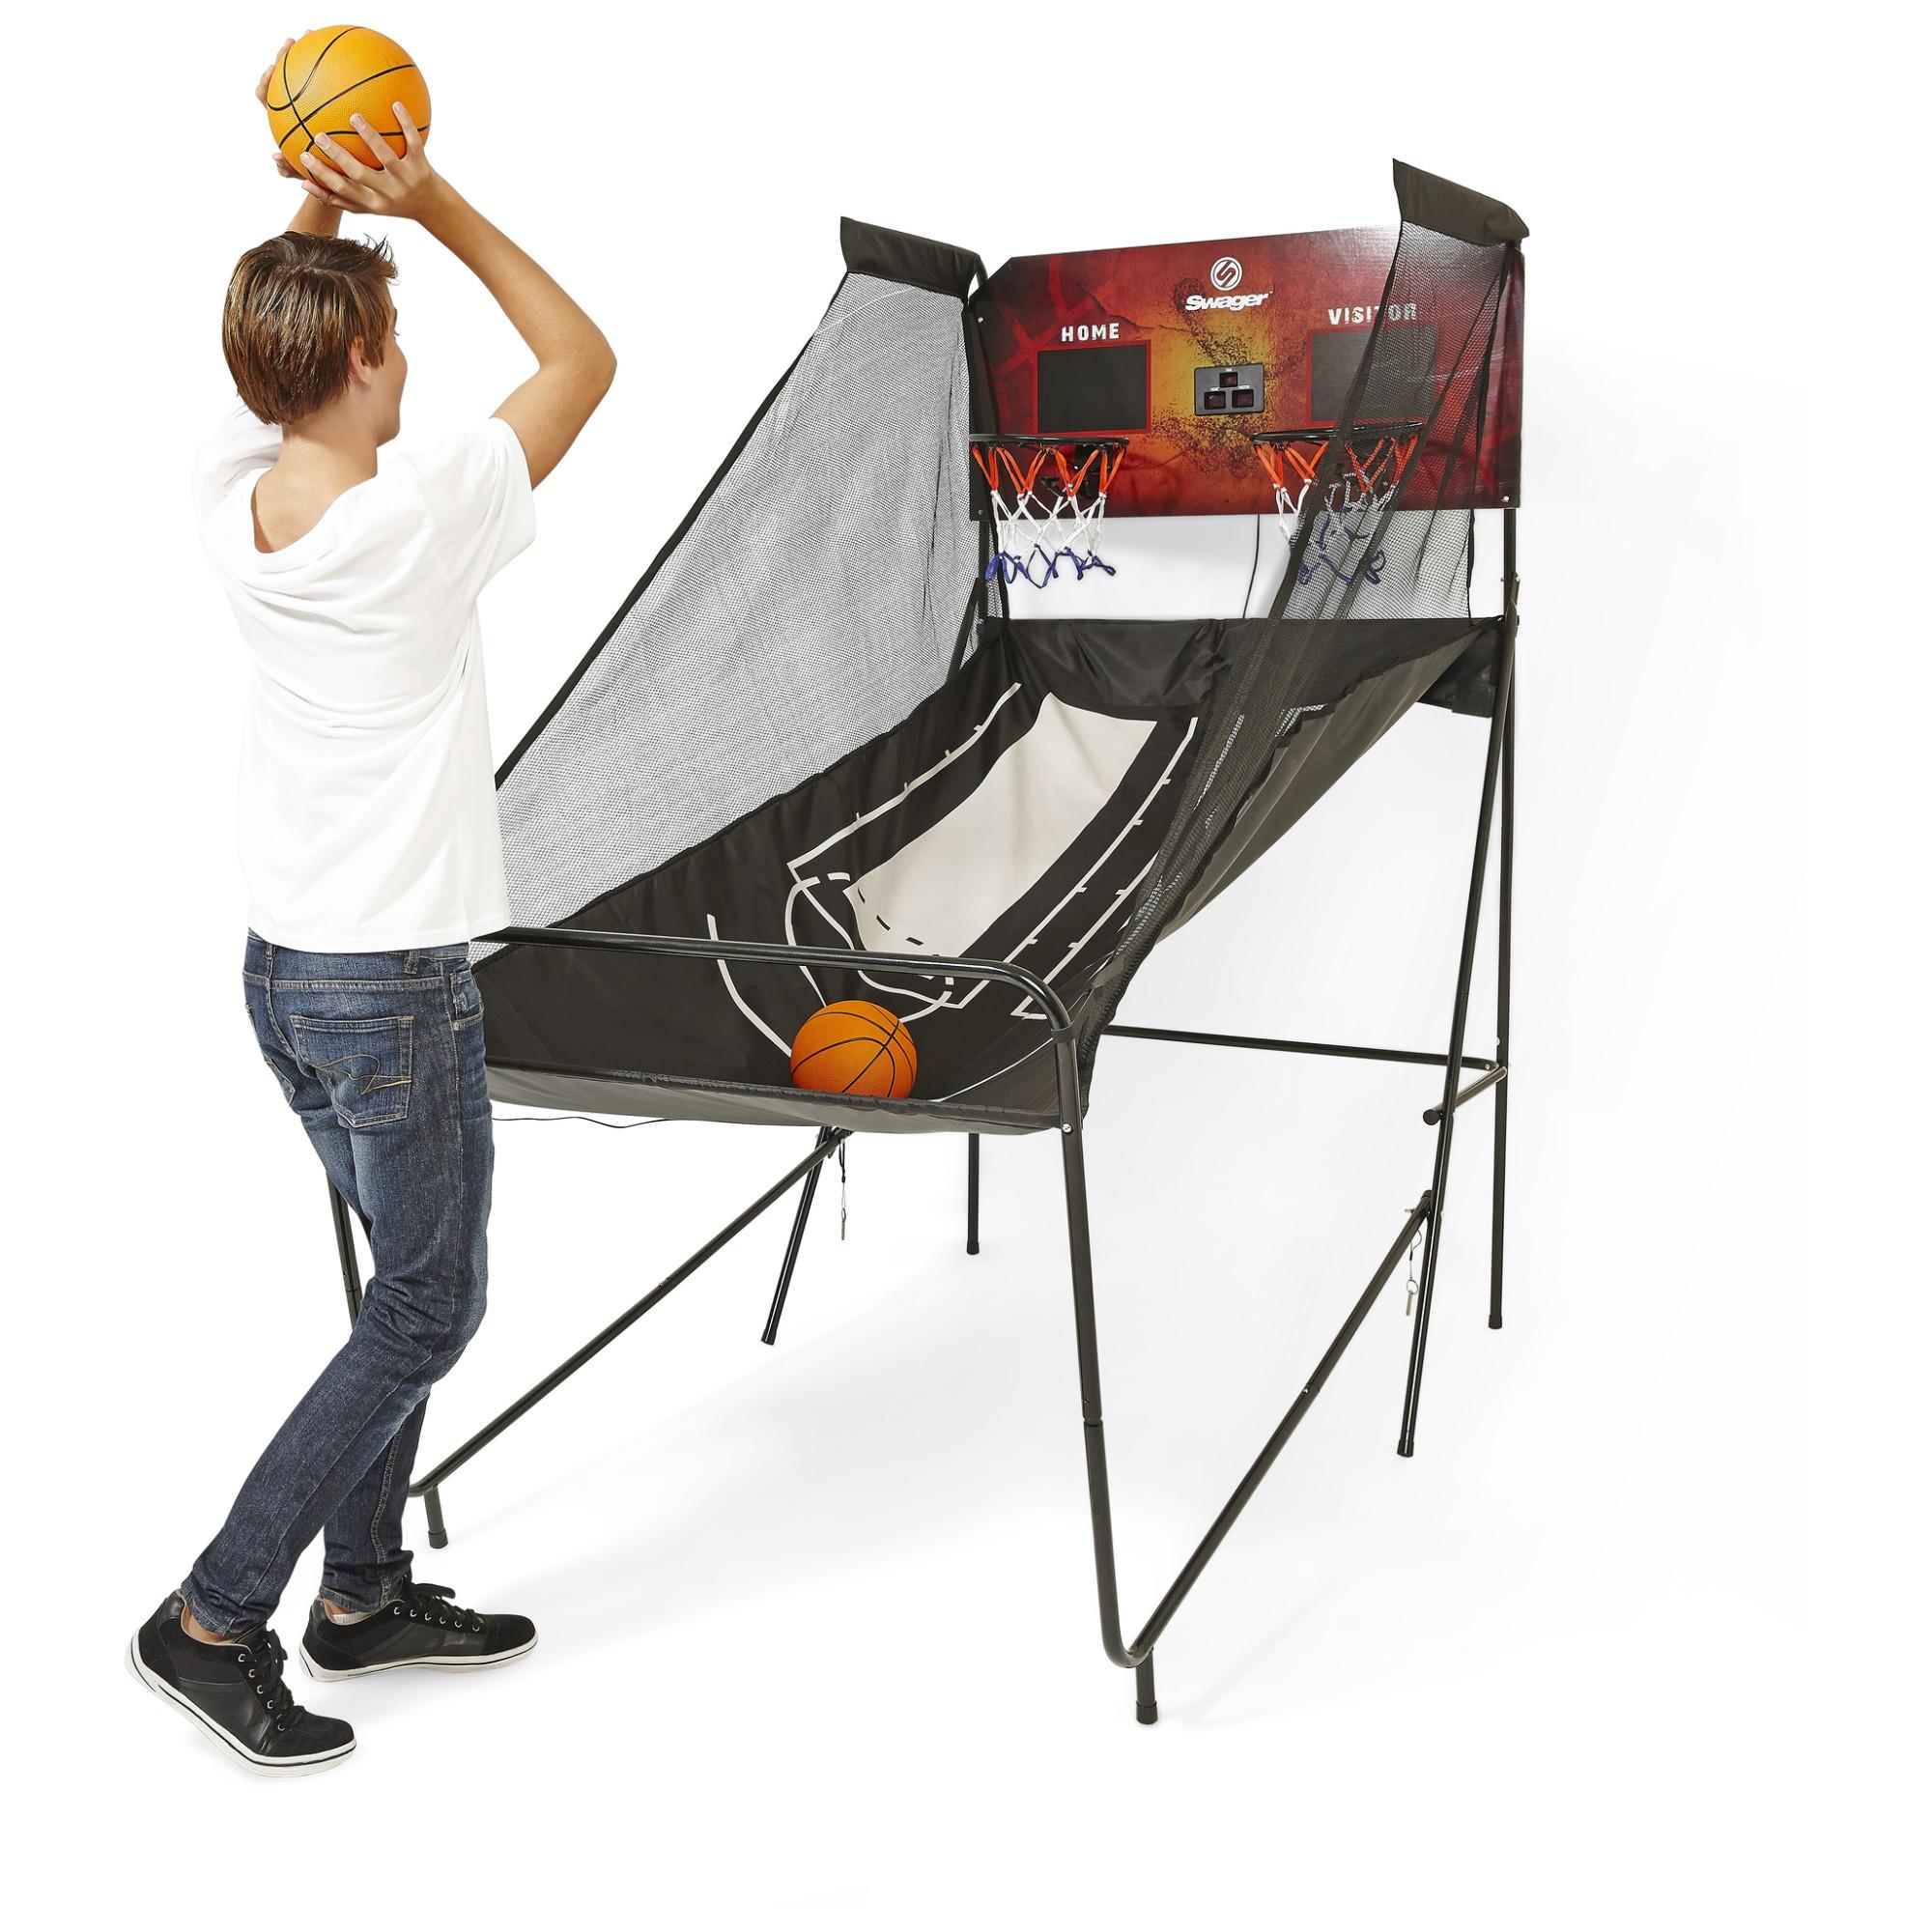 jeu-panier-basket-double-shot-swager